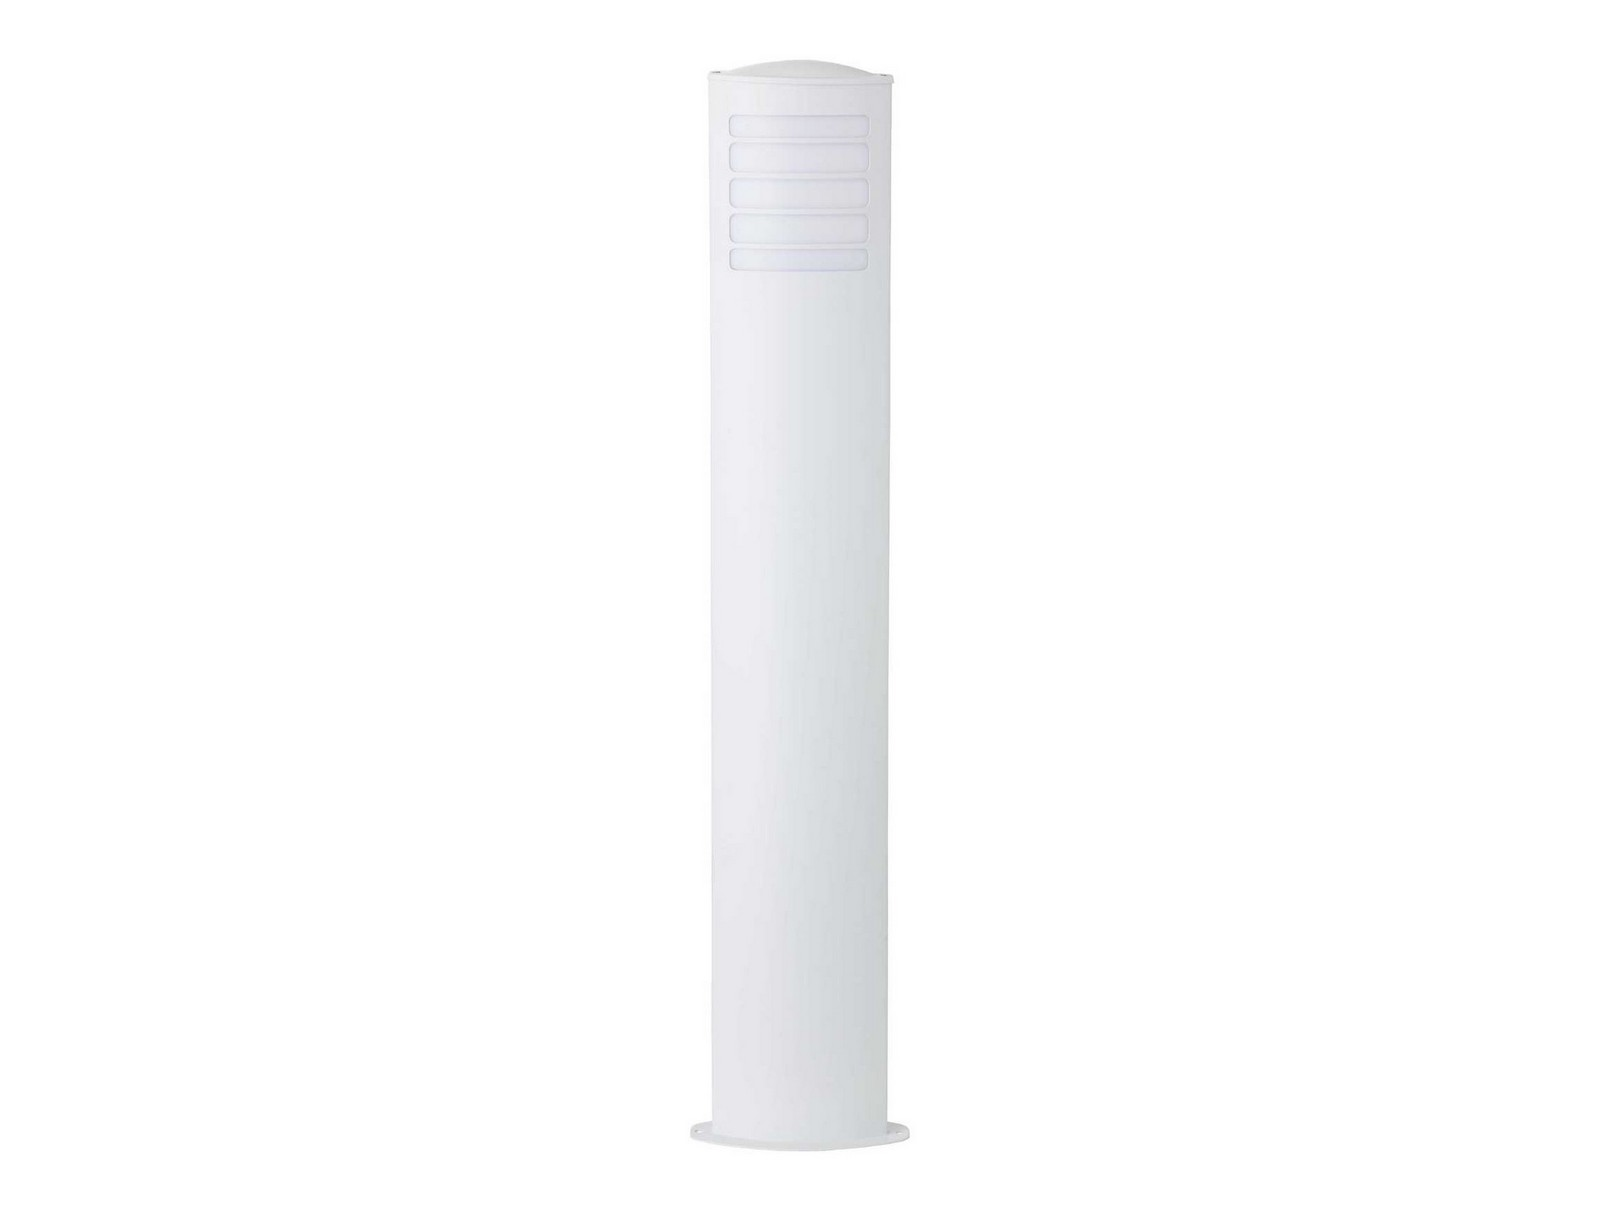 Светильник уличный ToddУличные наземные светильники<br>Вид цоколя: E27&amp;amp;nbsp;&amp;lt;div&amp;gt;Мощность ламп: 60W&amp;lt;br&amp;gt;&amp;lt;div&amp;gt;Количество ламп: 1&amp;amp;nbsp;&amp;lt;/div&amp;gt;&amp;lt;div&amp;gt;Наличие ламп: отсутствуют&amp;lt;/div&amp;gt;&amp;lt;/div&amp;gt;<br><br>Material: Пластик<br>Width см: 7<br>Depth см: 16,5<br>Height см: 100